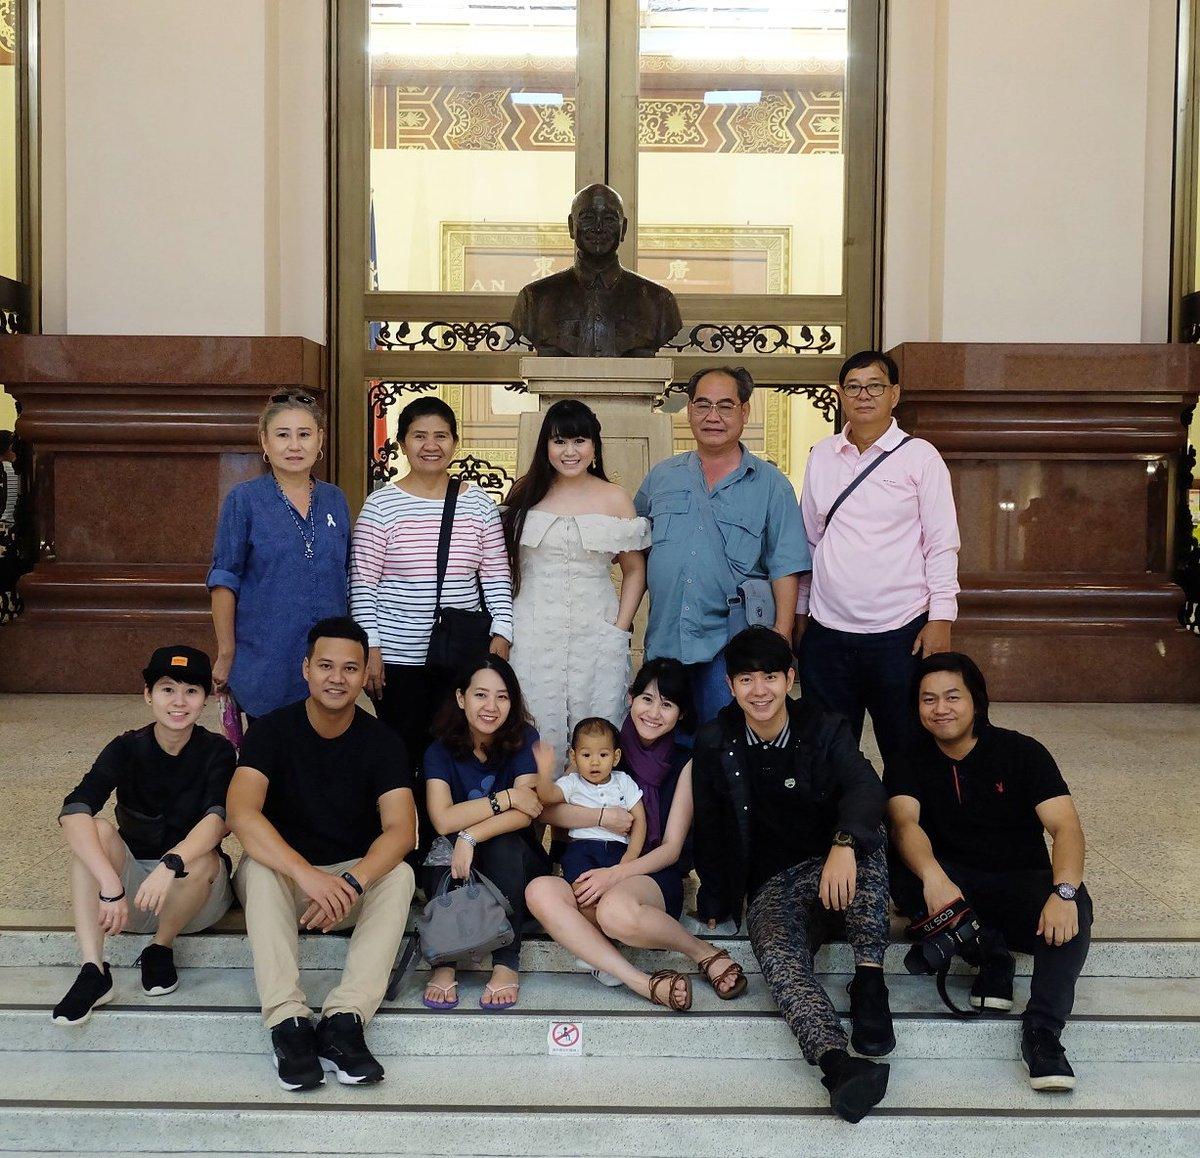 Family Trip in Taiwan  ถ่ายรูปข้างนอก ไม...